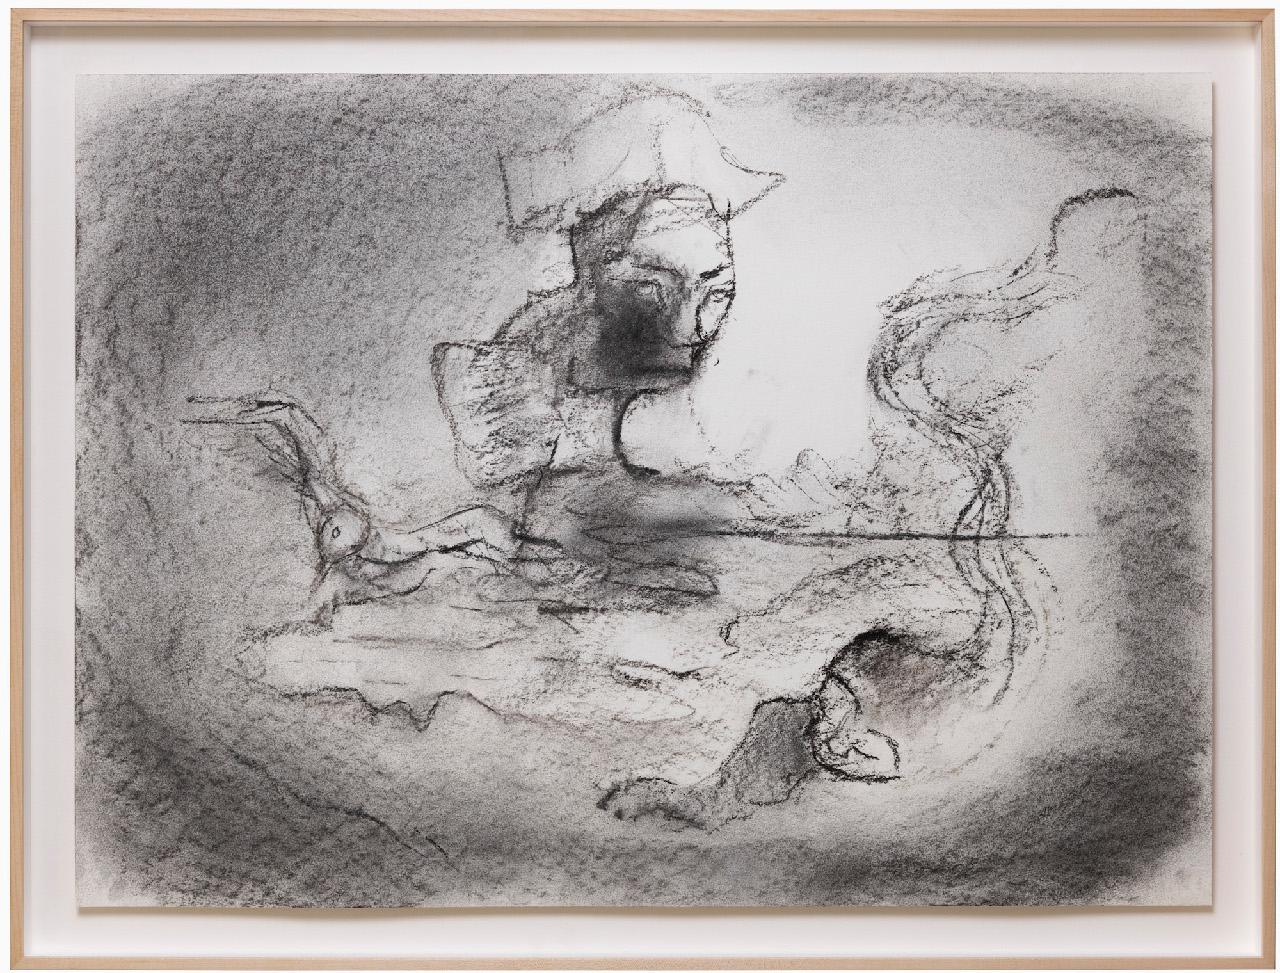 07_Leiko Ikemura_Mexican Afterworld, 2011, charcoal on paper, 55,8x76 cm